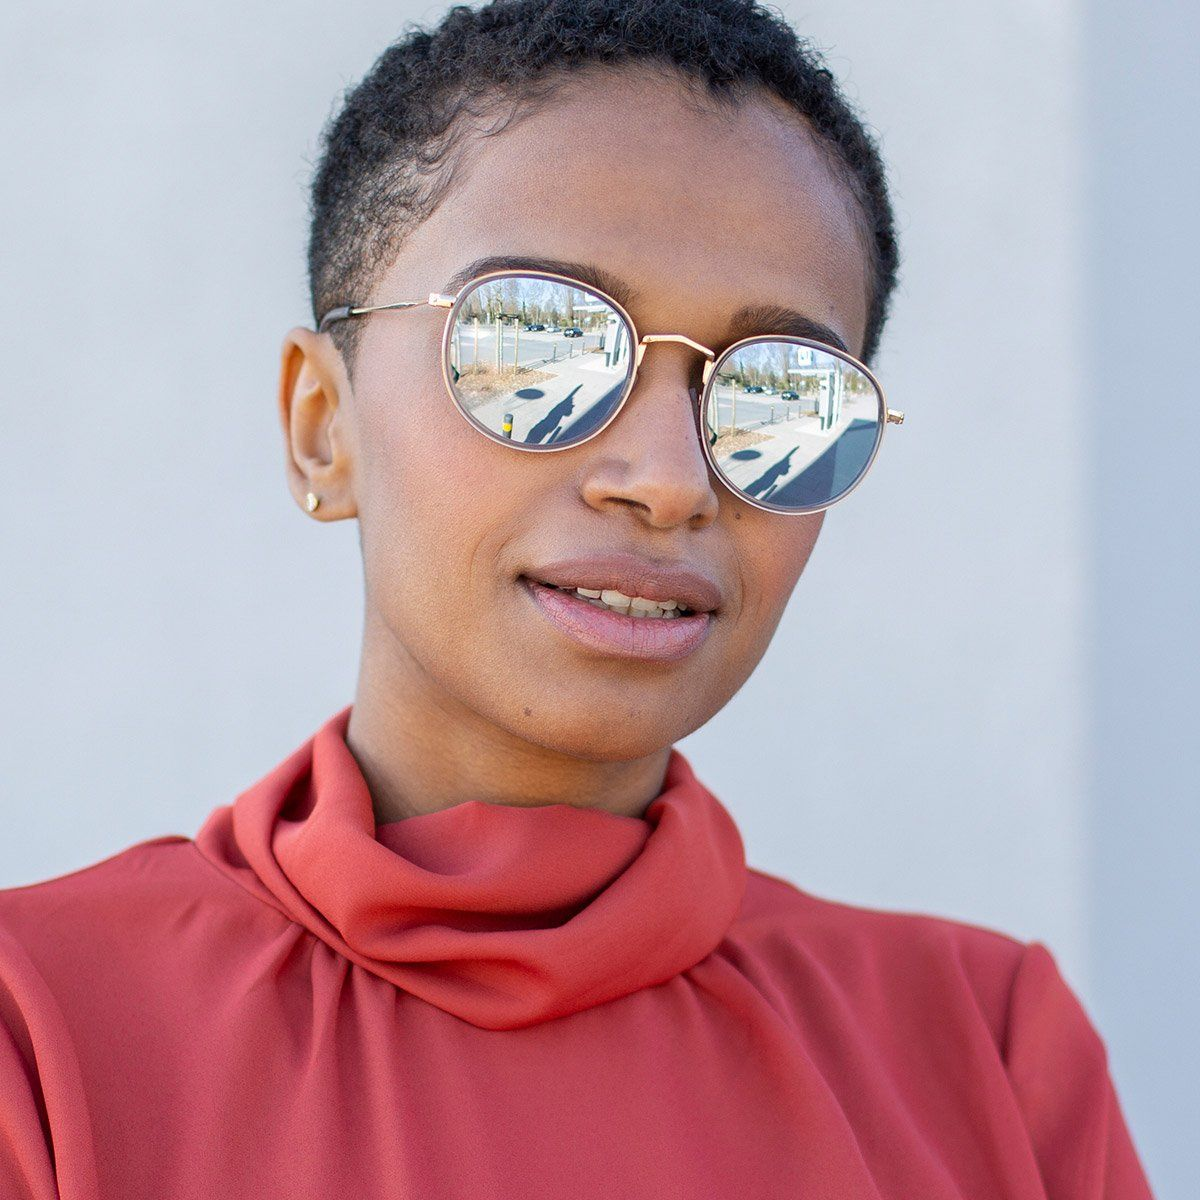 Verspiegelte Sonnenbrille Verspiegelte Sonnenbrille Sonnenbrille Brille